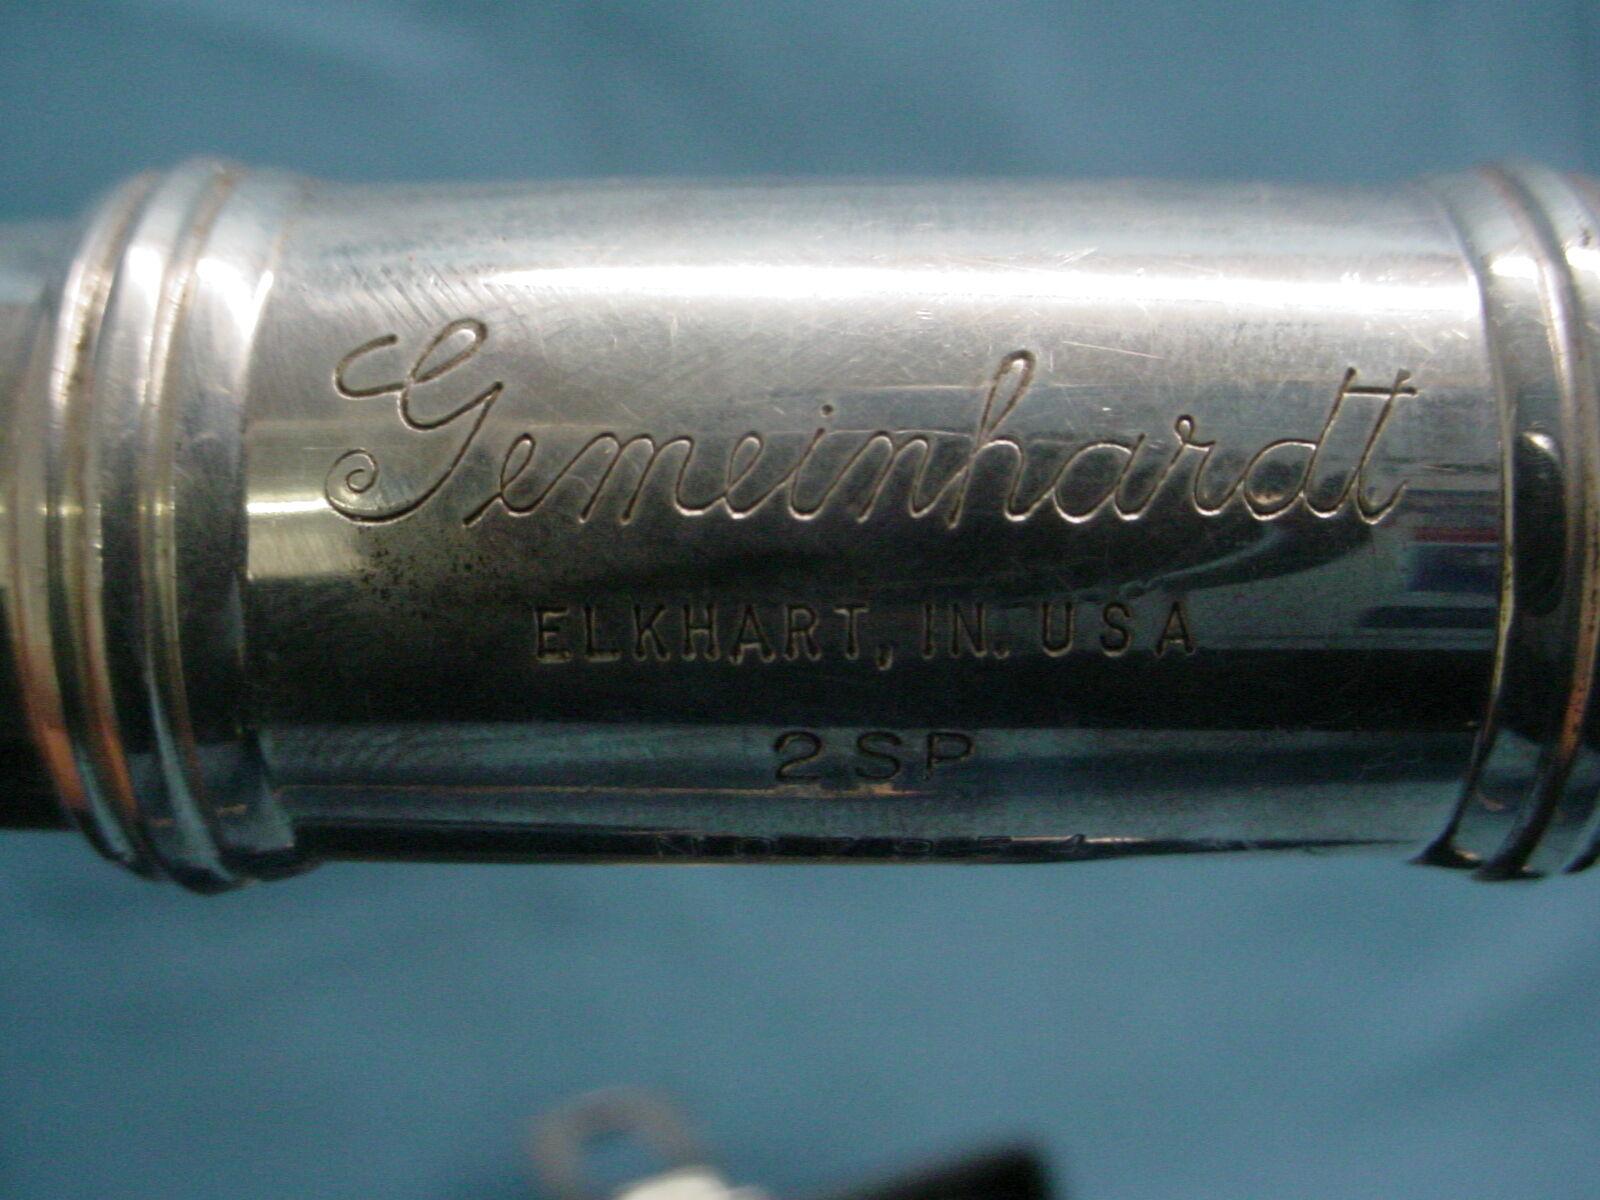 3 flauta Gemeinhardt Elkhart 2SP Plata Plateado Con Estuche Estuche Estuche 0d6009